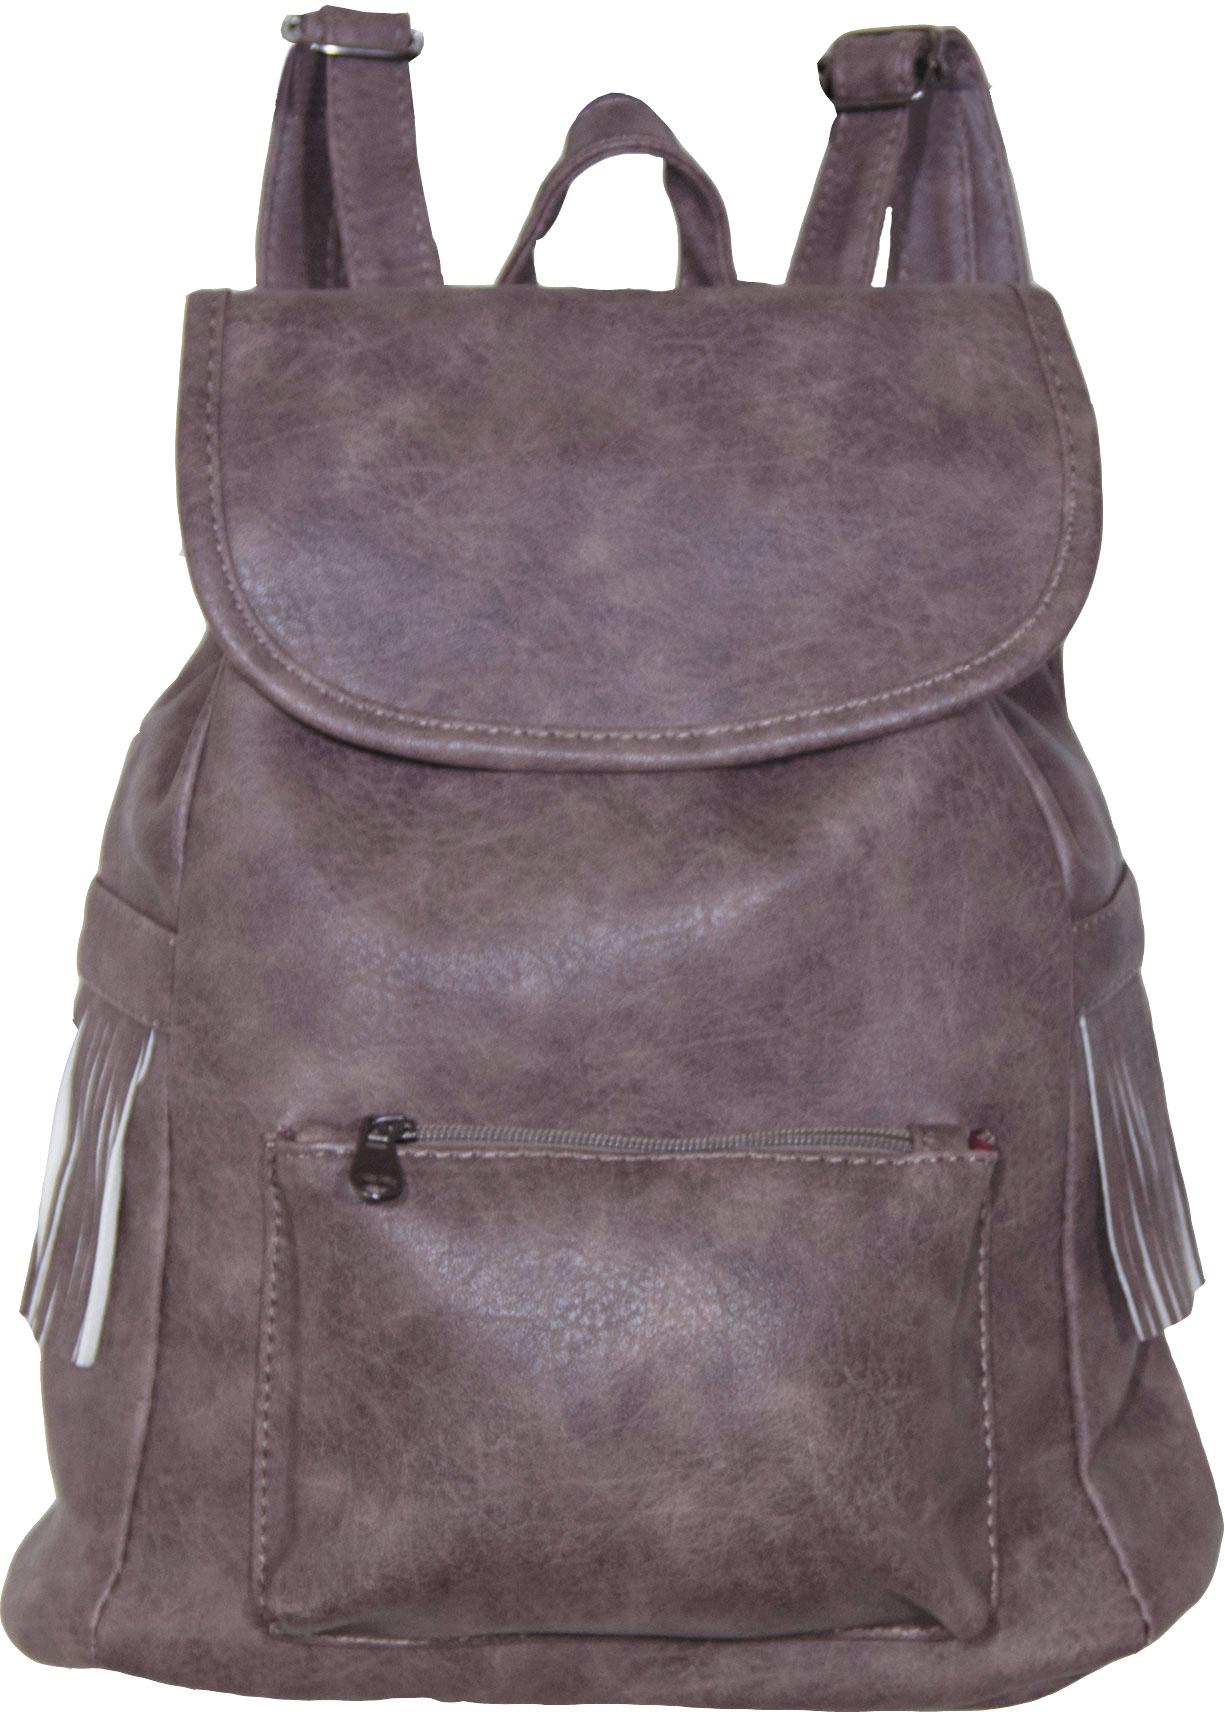 Backpack No 424 - Σοκολά (Silvio 424)